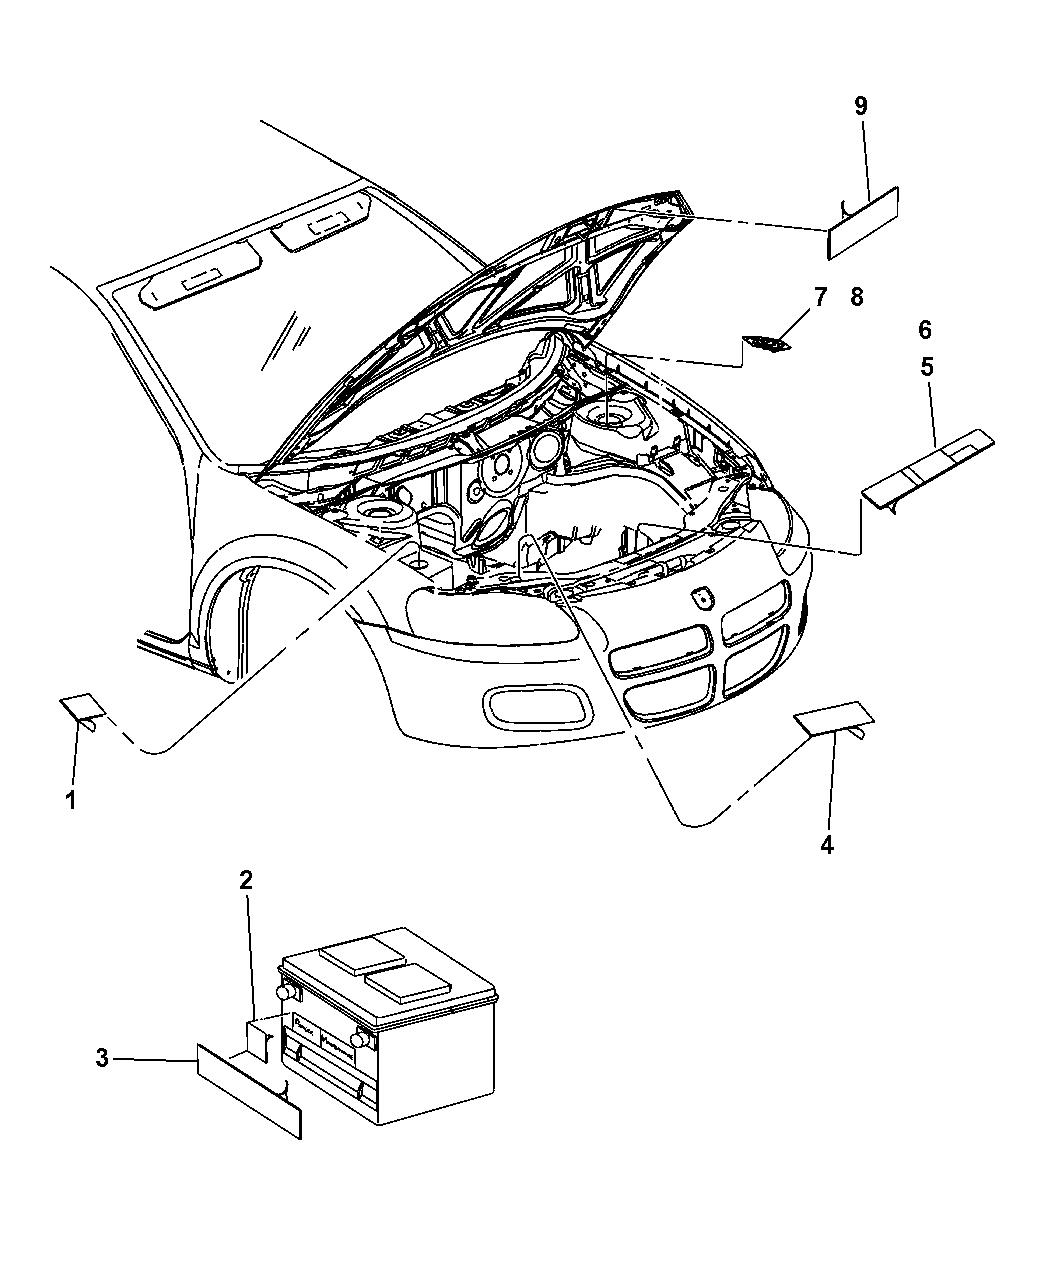 2005 Chrysler Sebring Sedan Convertible Engine Compartment 05 Diagram